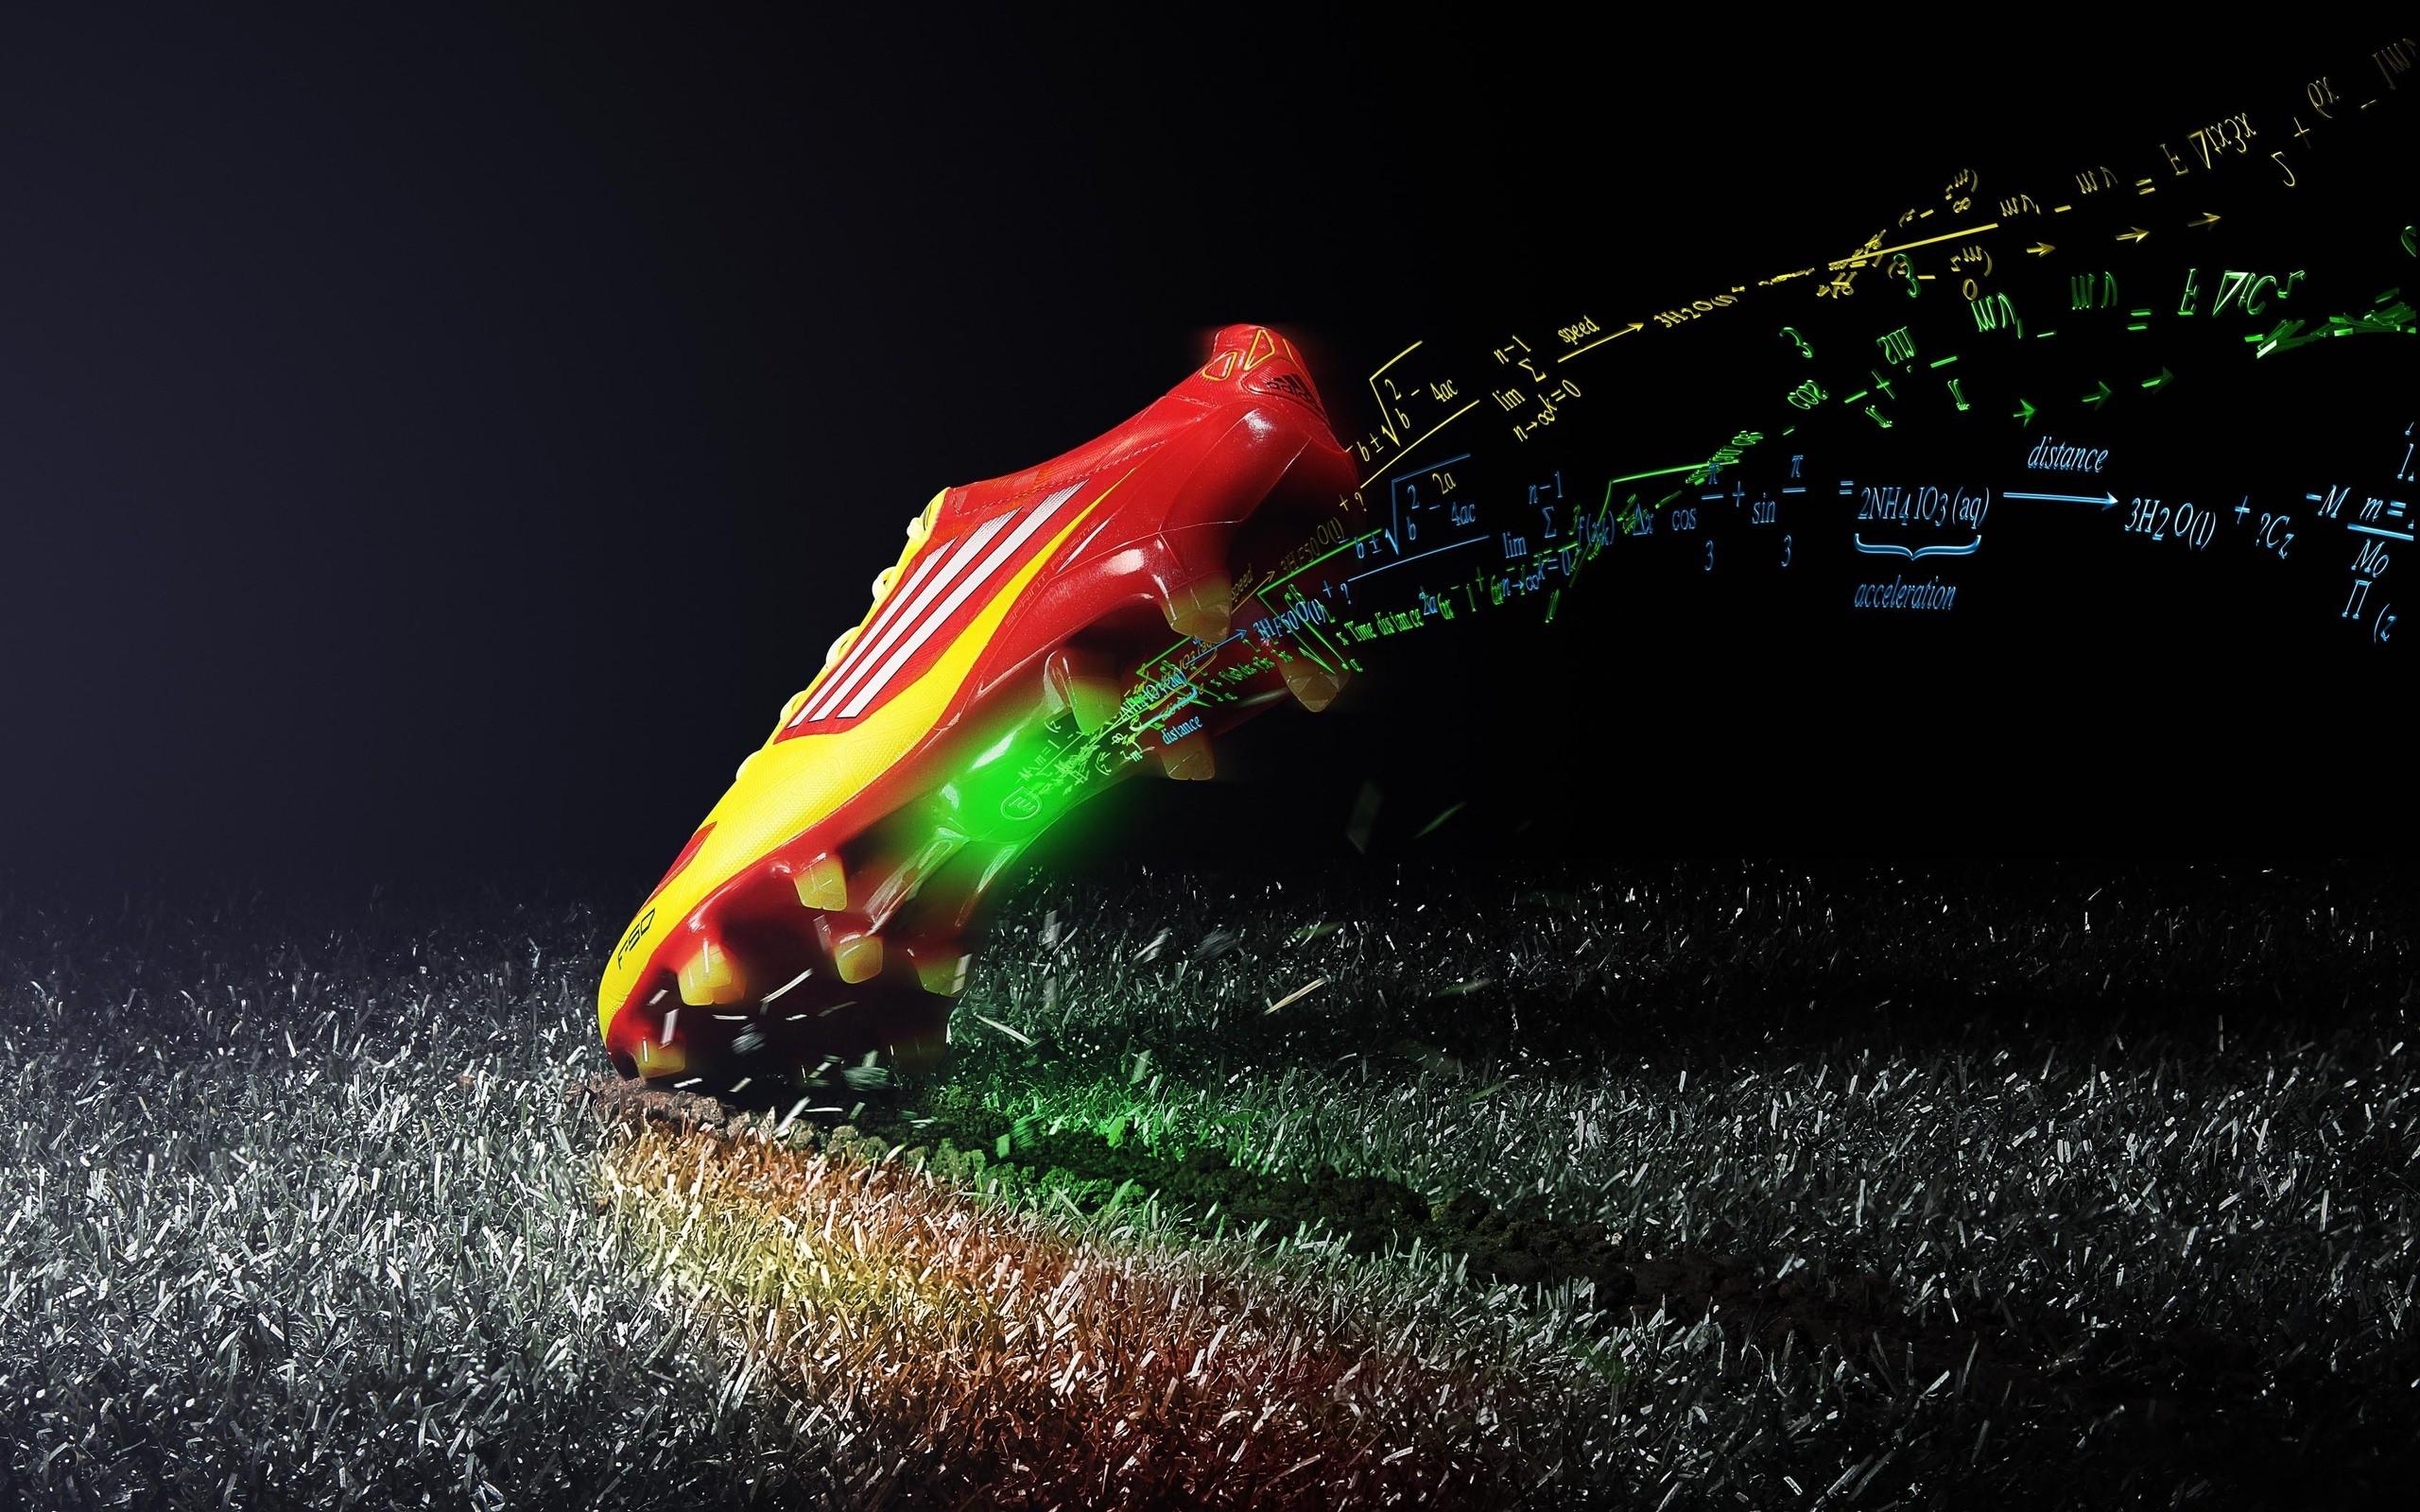 Adidas shoes sneakers mathematical formula physics formula wallpaper 2560x1600